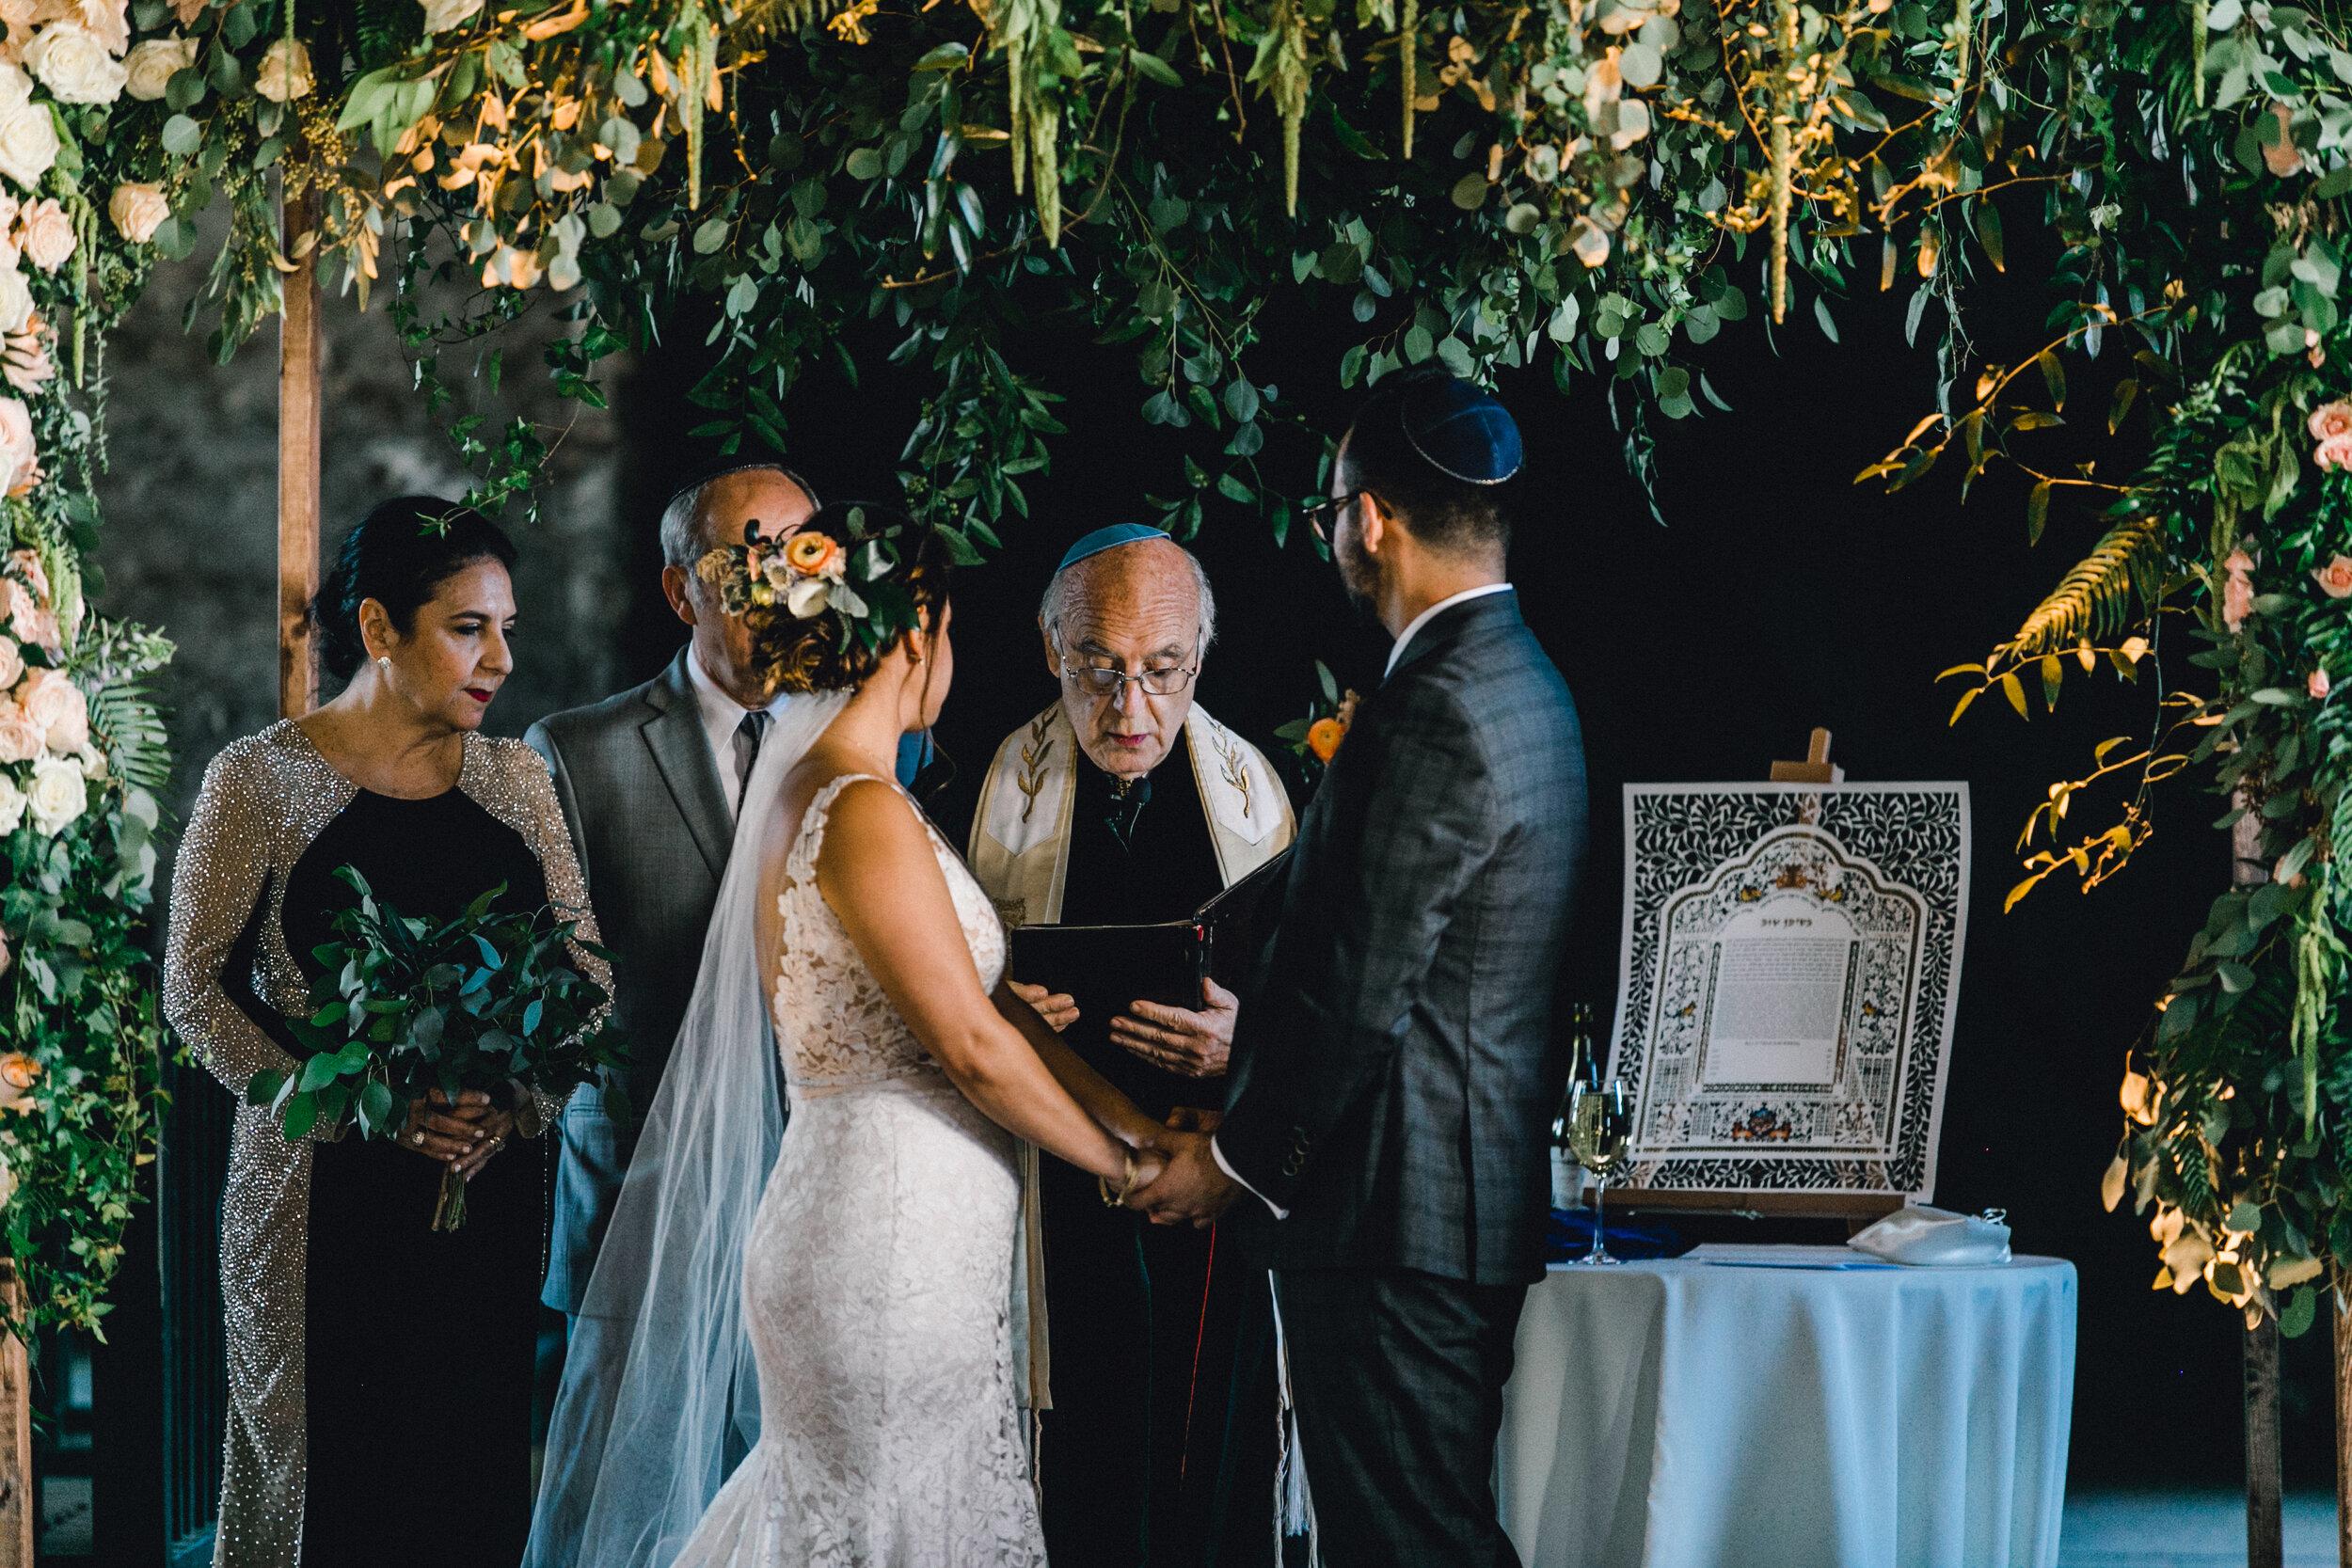 ivory-and-beau-blog-weddings-ivory-and-beau-couple-dominique-and-andres-savannah-florist-wedding-planning-savannah-bridal-boutique-wedding-flowers-KIP_WEBERWEDDING_RAILROADMUSEUM-855.JPG